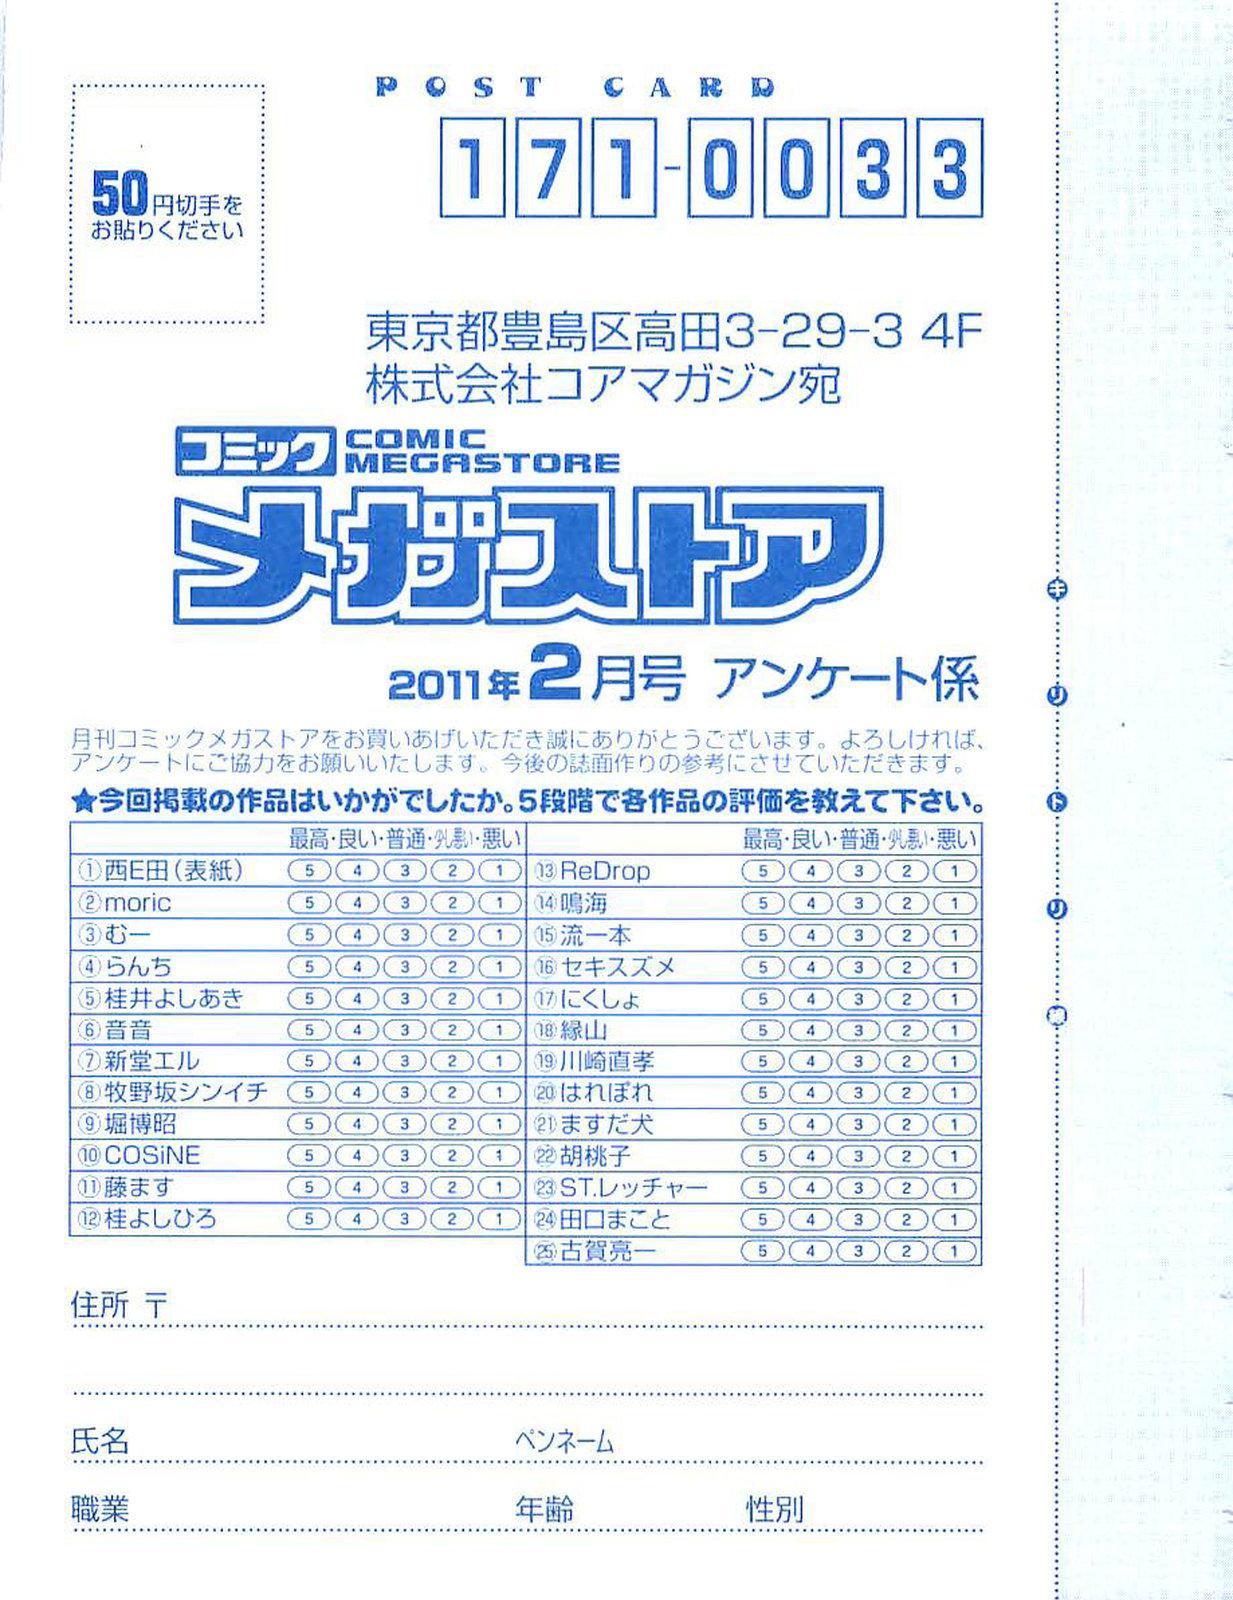 COMIC Megastore 2011-02 534